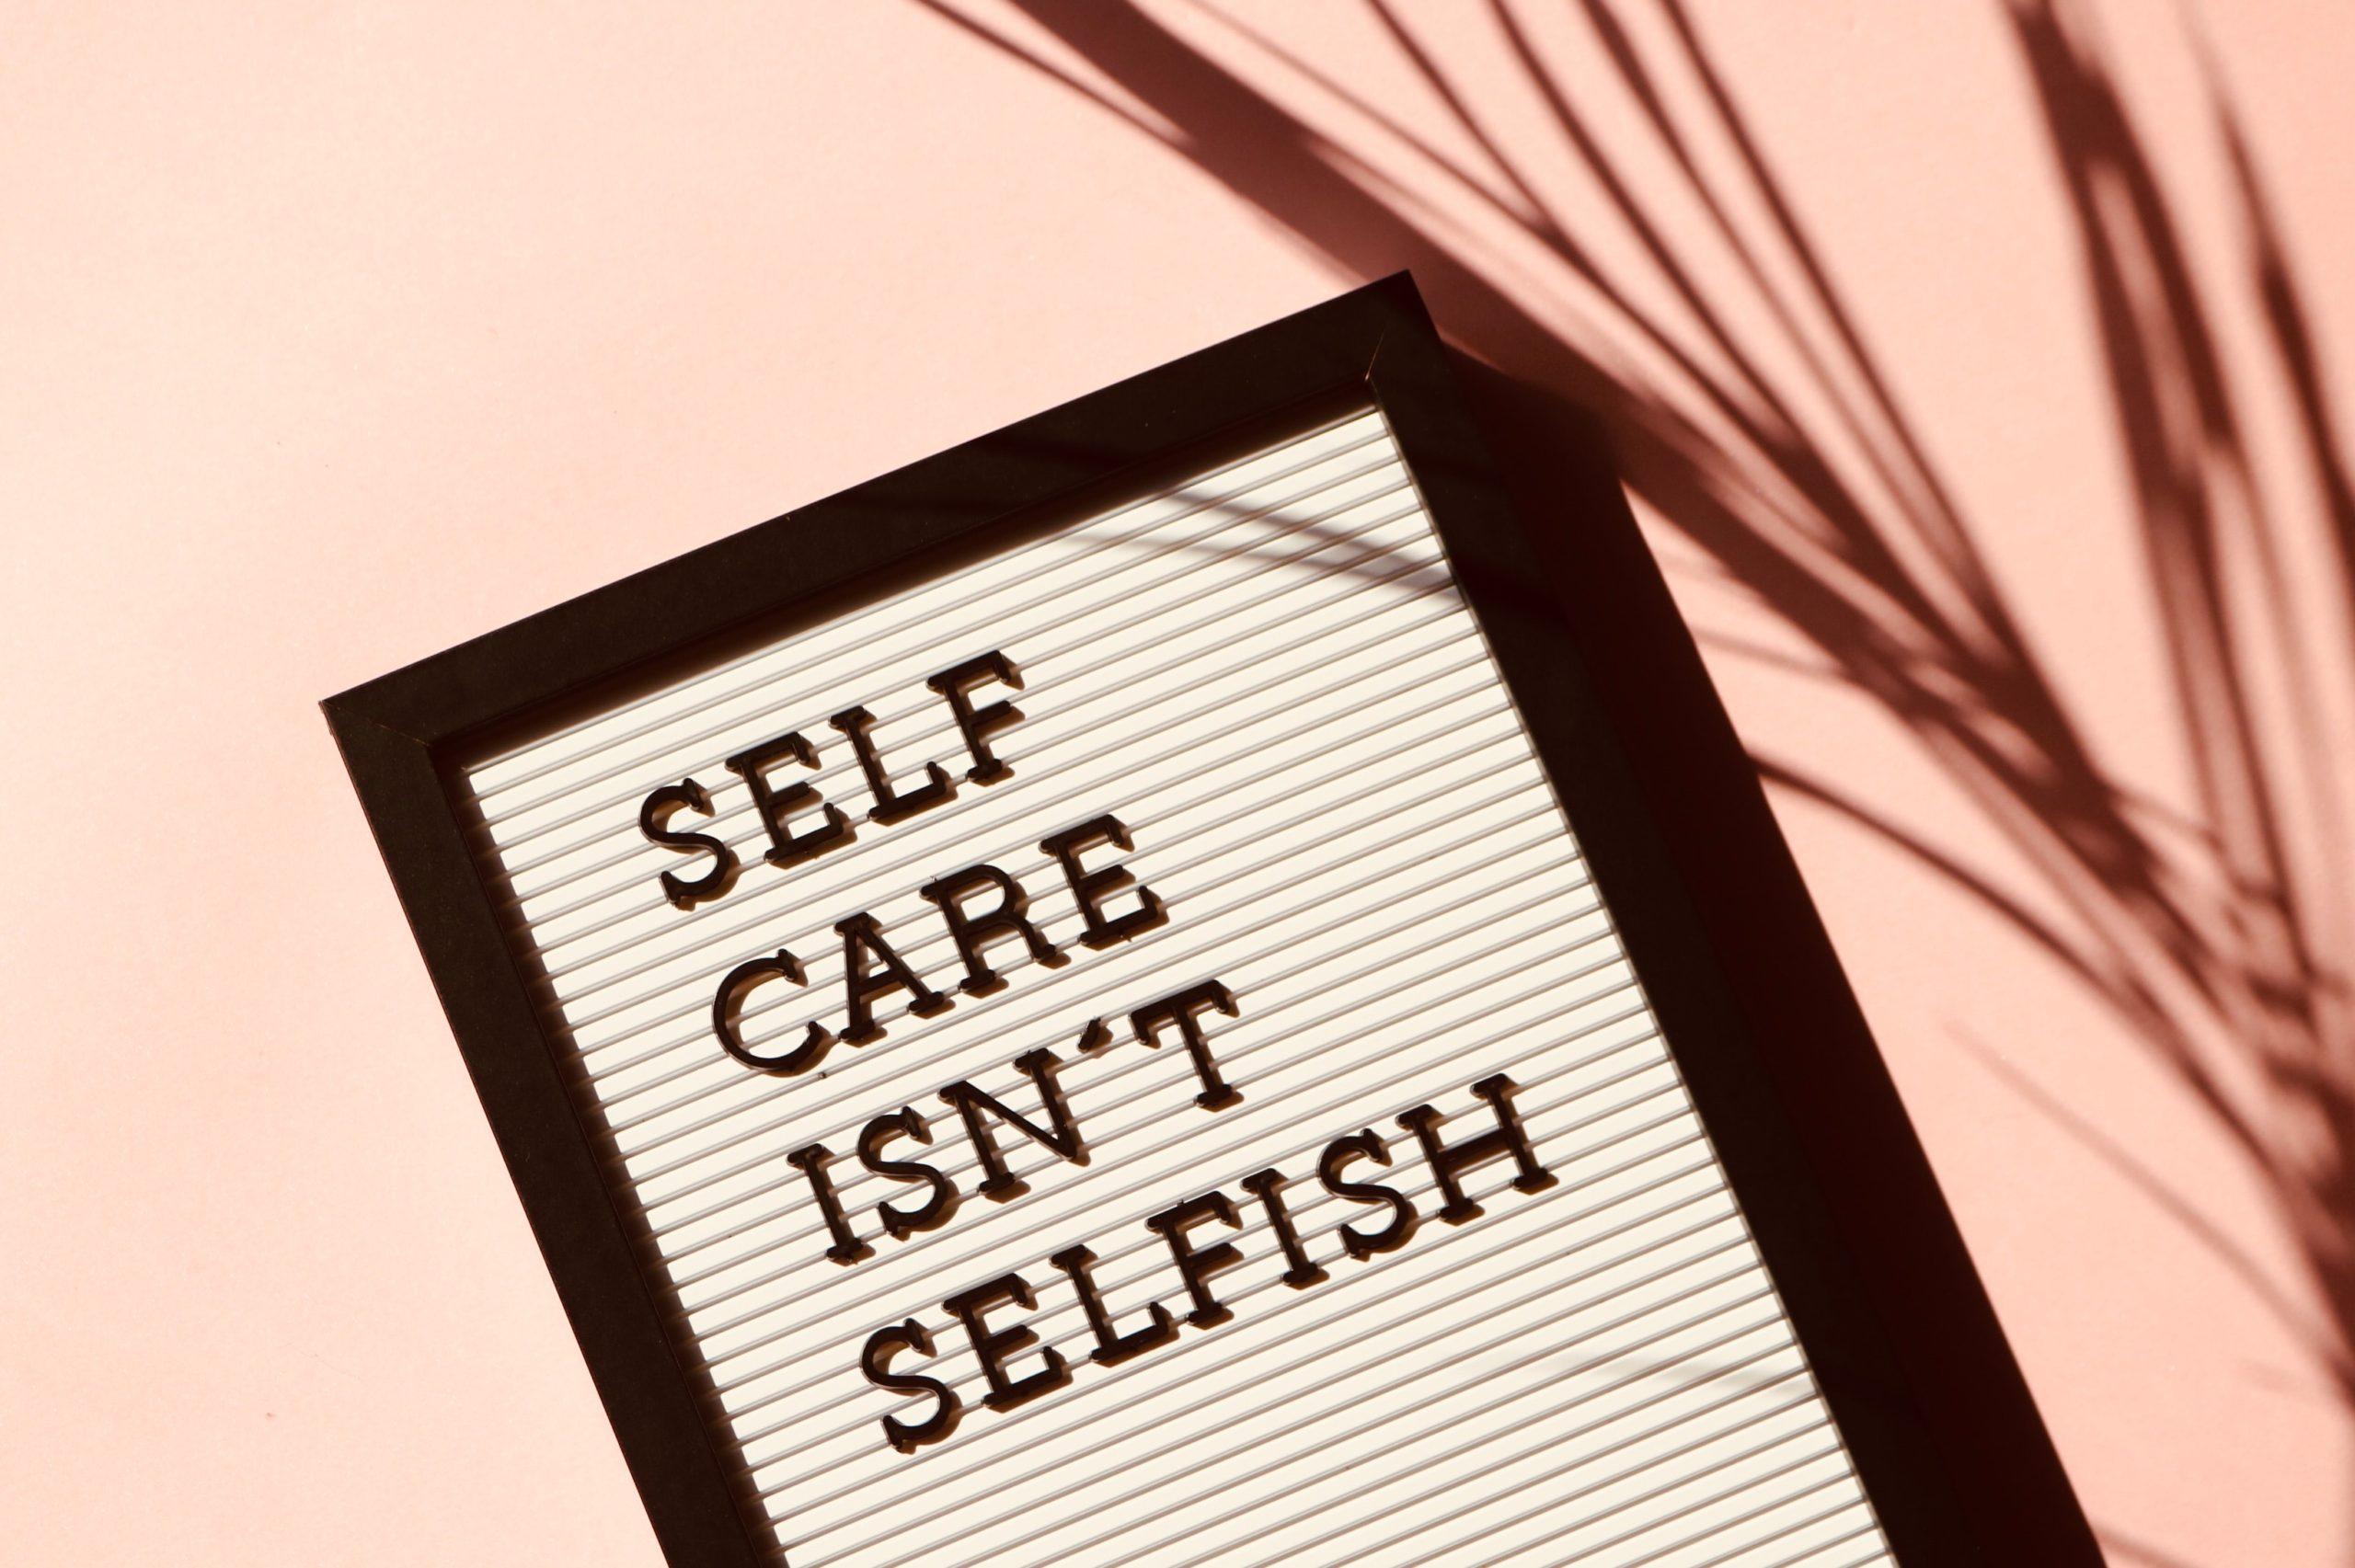 self-care-isn-t-selfish-signage-2821823